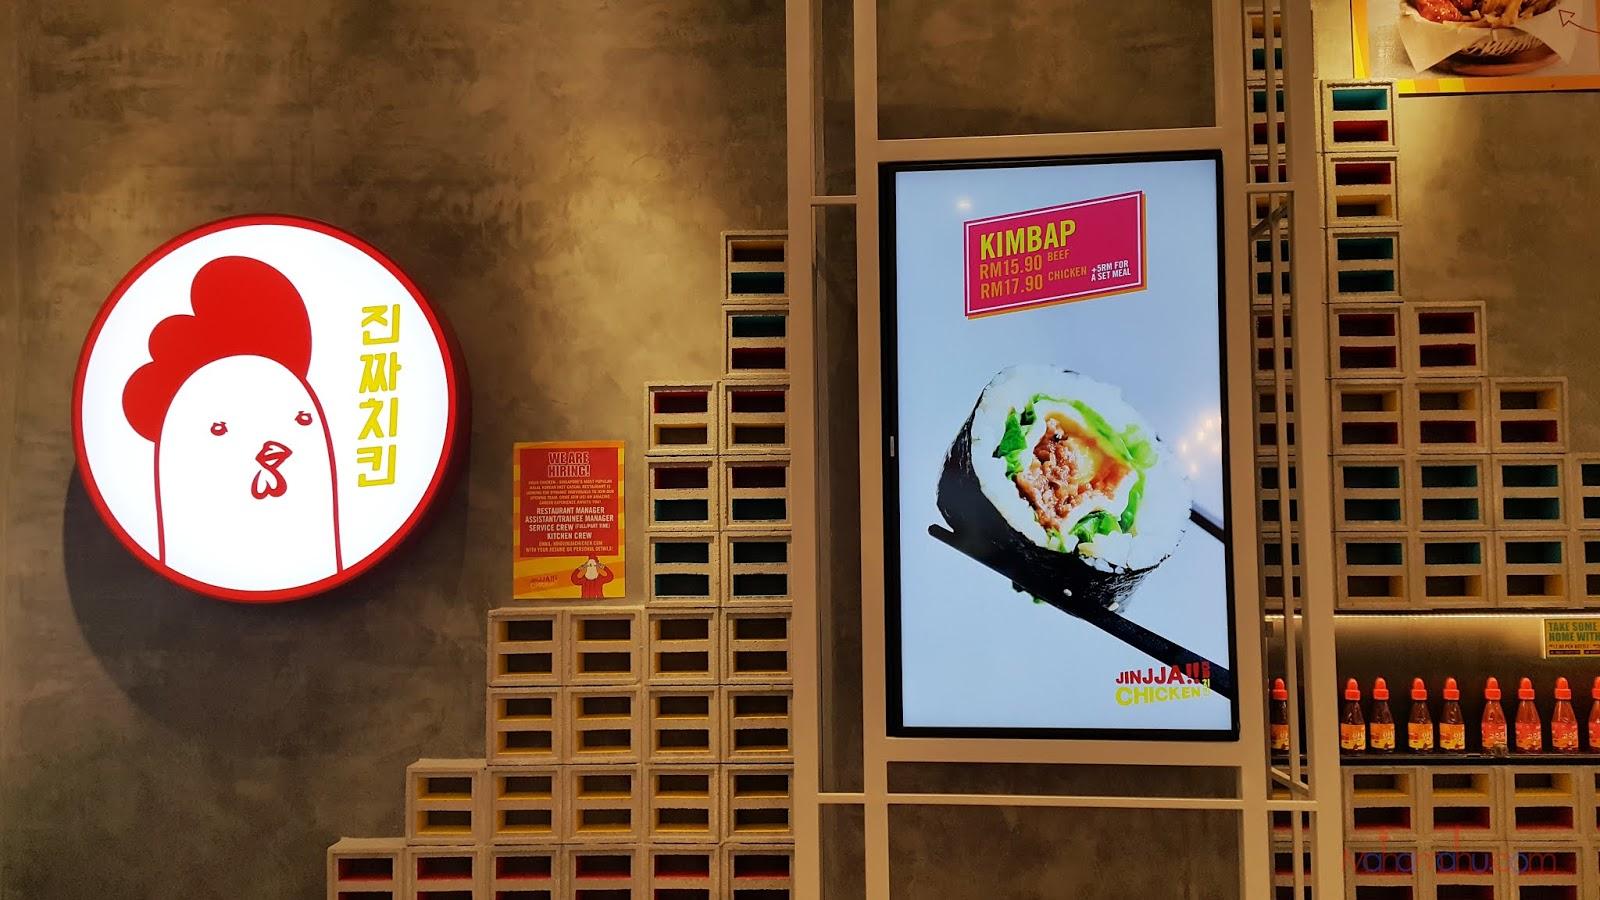 Googliercom Peru Search Date 2018 11 20 Celana Pria Pendek Dry Fit Merah Cln 654 Sebab Tu Sekarang Ni Jinjja Chicken Telah Membuka Cawangan Mereka Di Kuala Lumpur Untuk Memberi Kepuasan Kepada Pecinta Makanan Ayam Goreng Korea